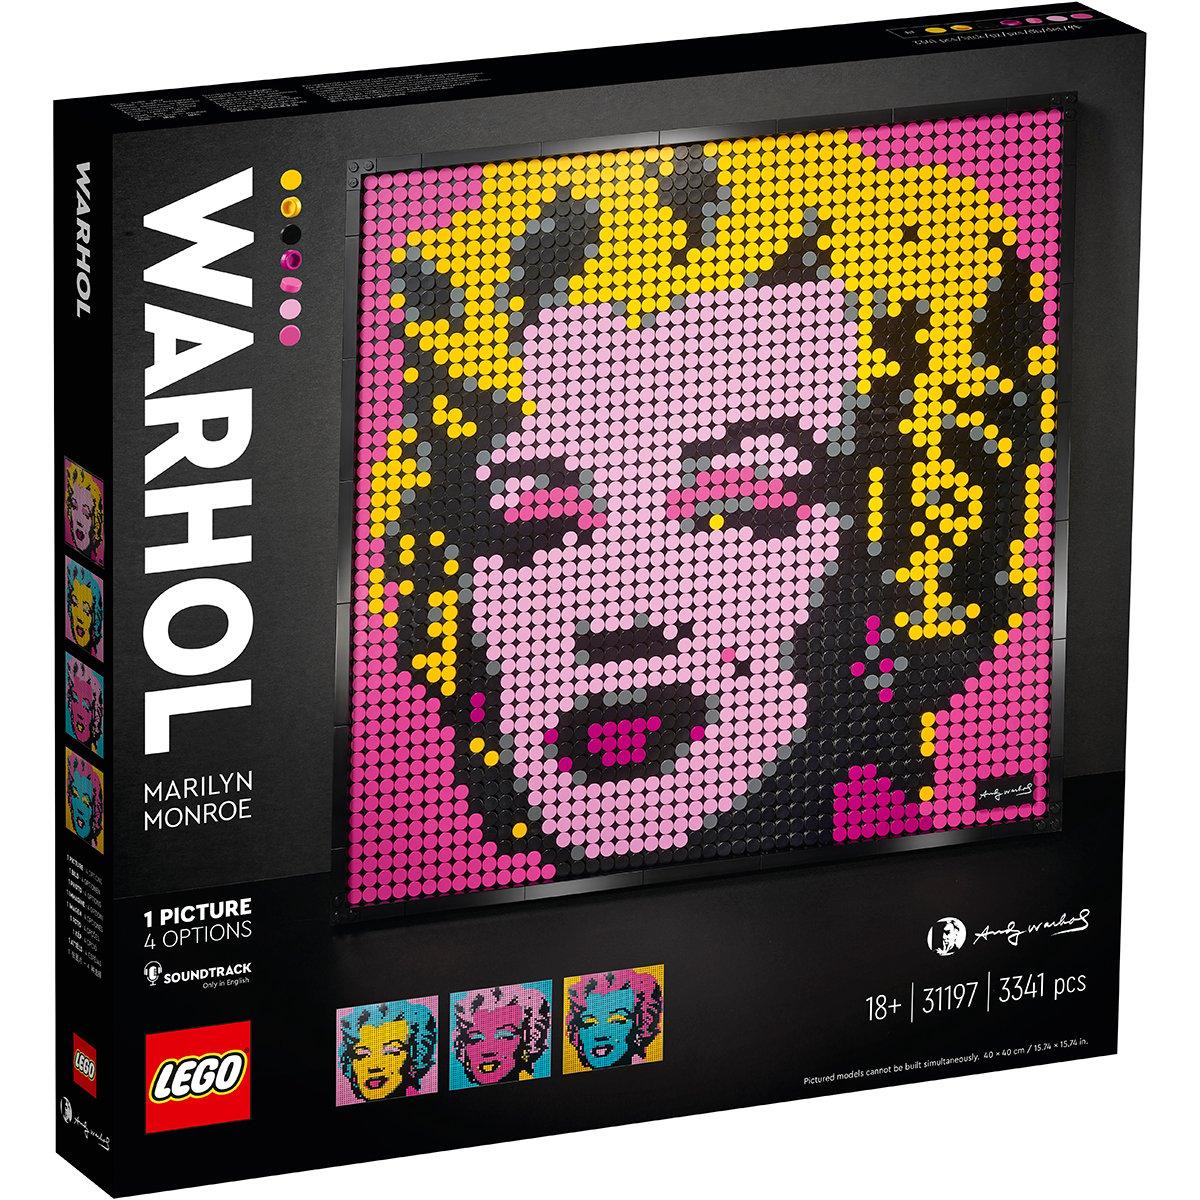 Lego® Art - Andy Warhol's Marilyn Monroe (31197)